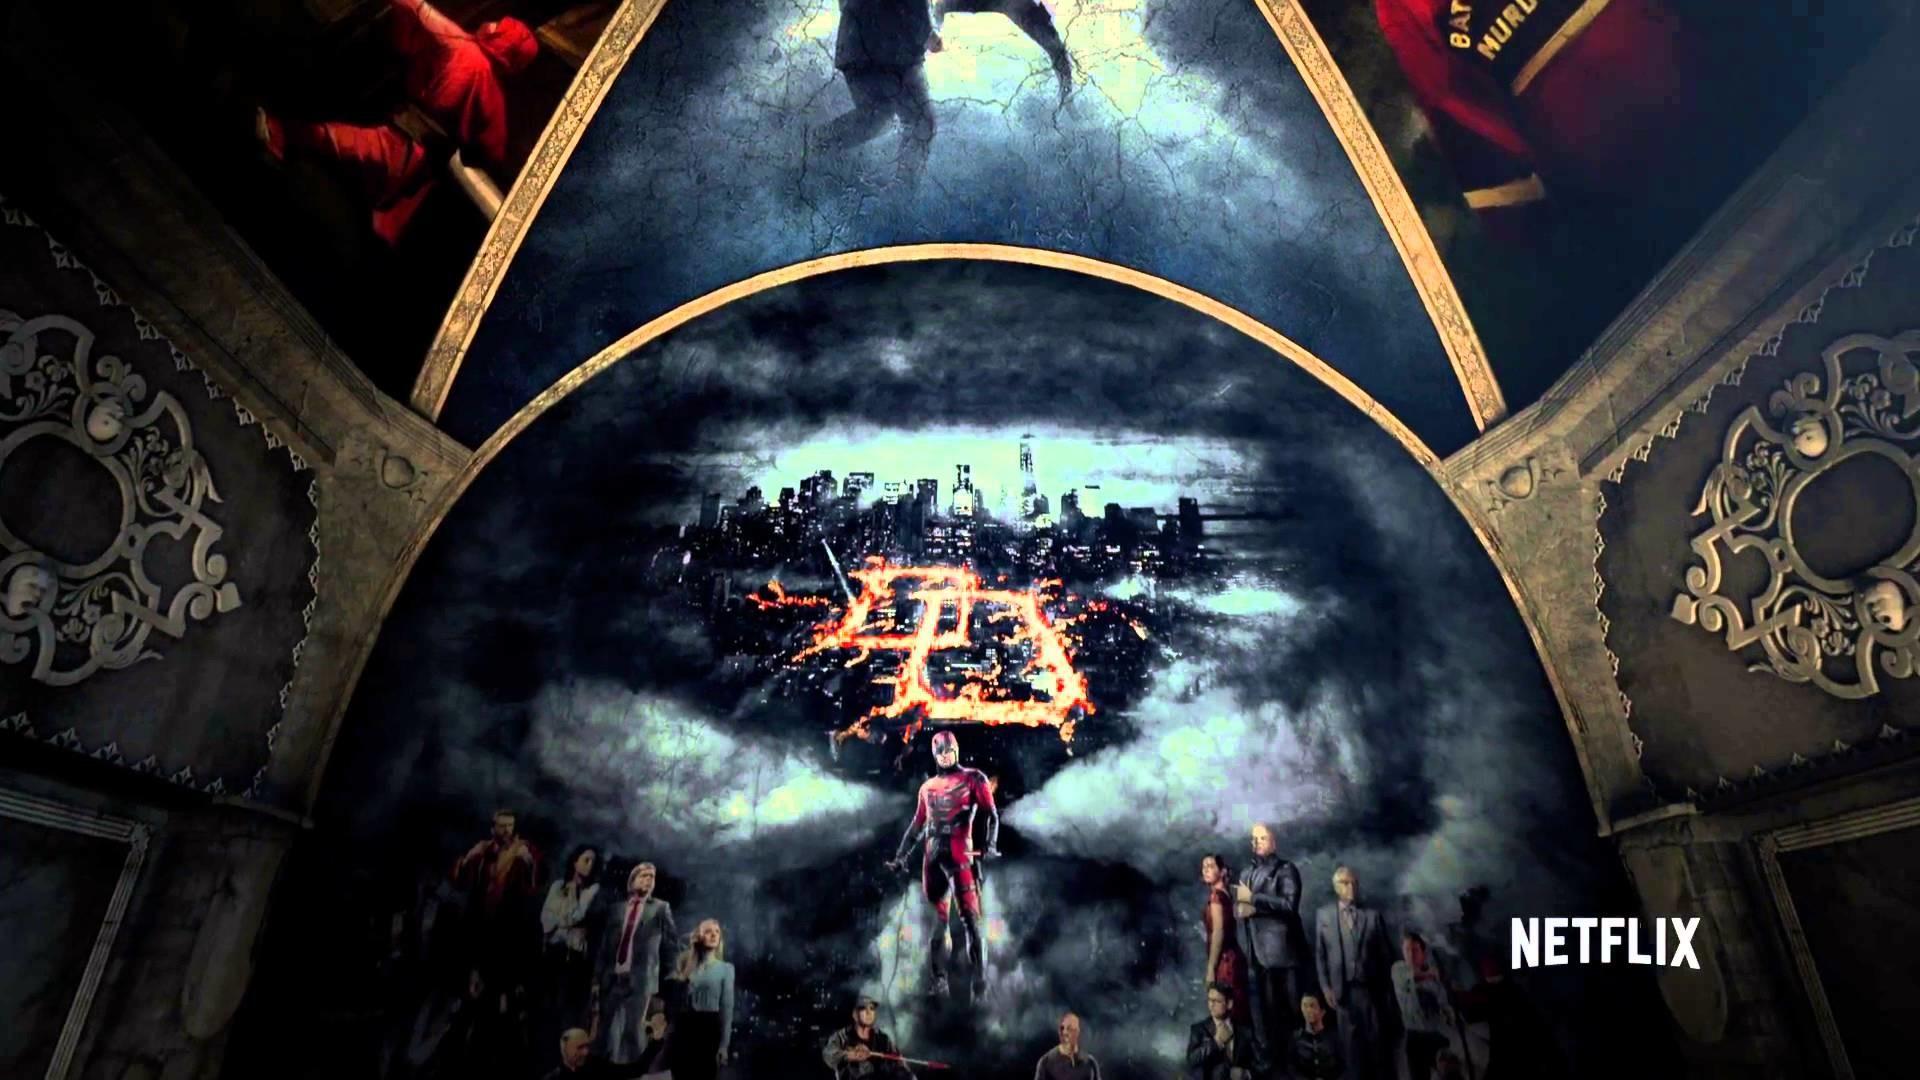 Marvel's DAREDEVIL Season 2 – Official Teaser Trailer #1 (2016) Netflix  Series HD – YouTube